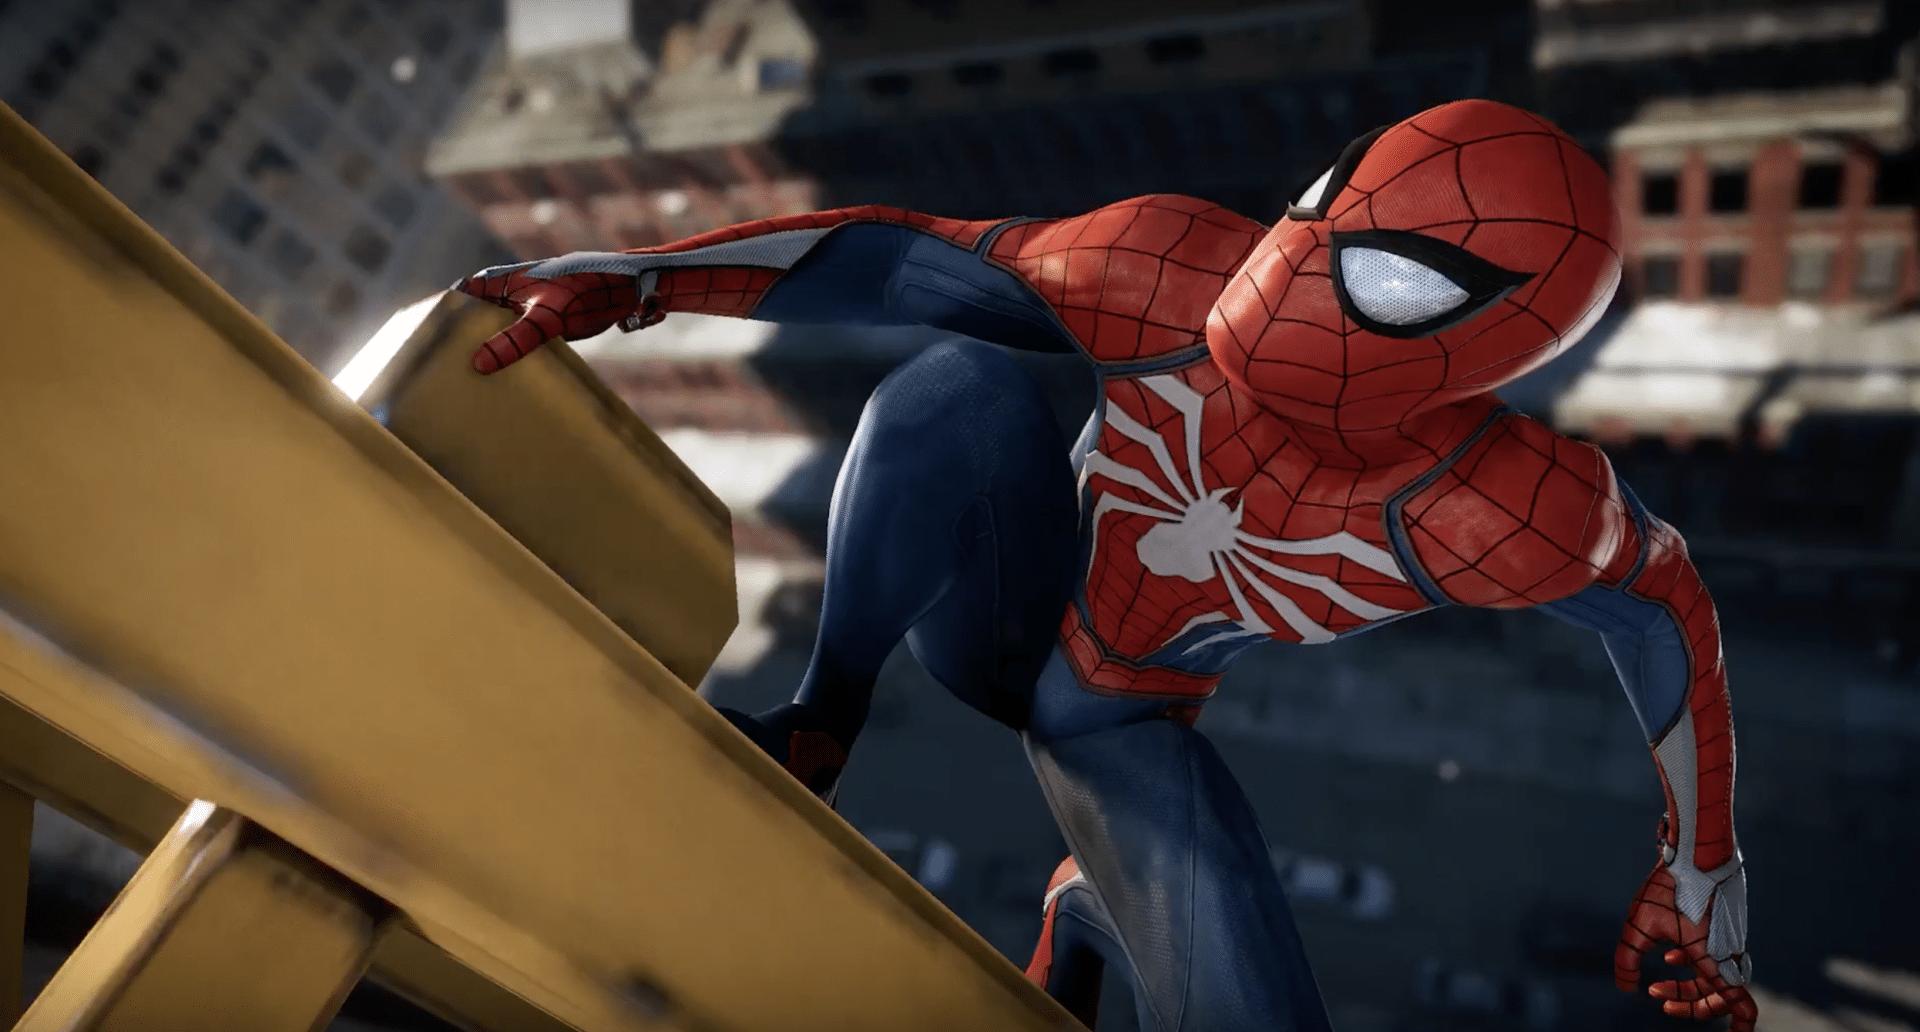 Spider-Man Ps4: Recensione